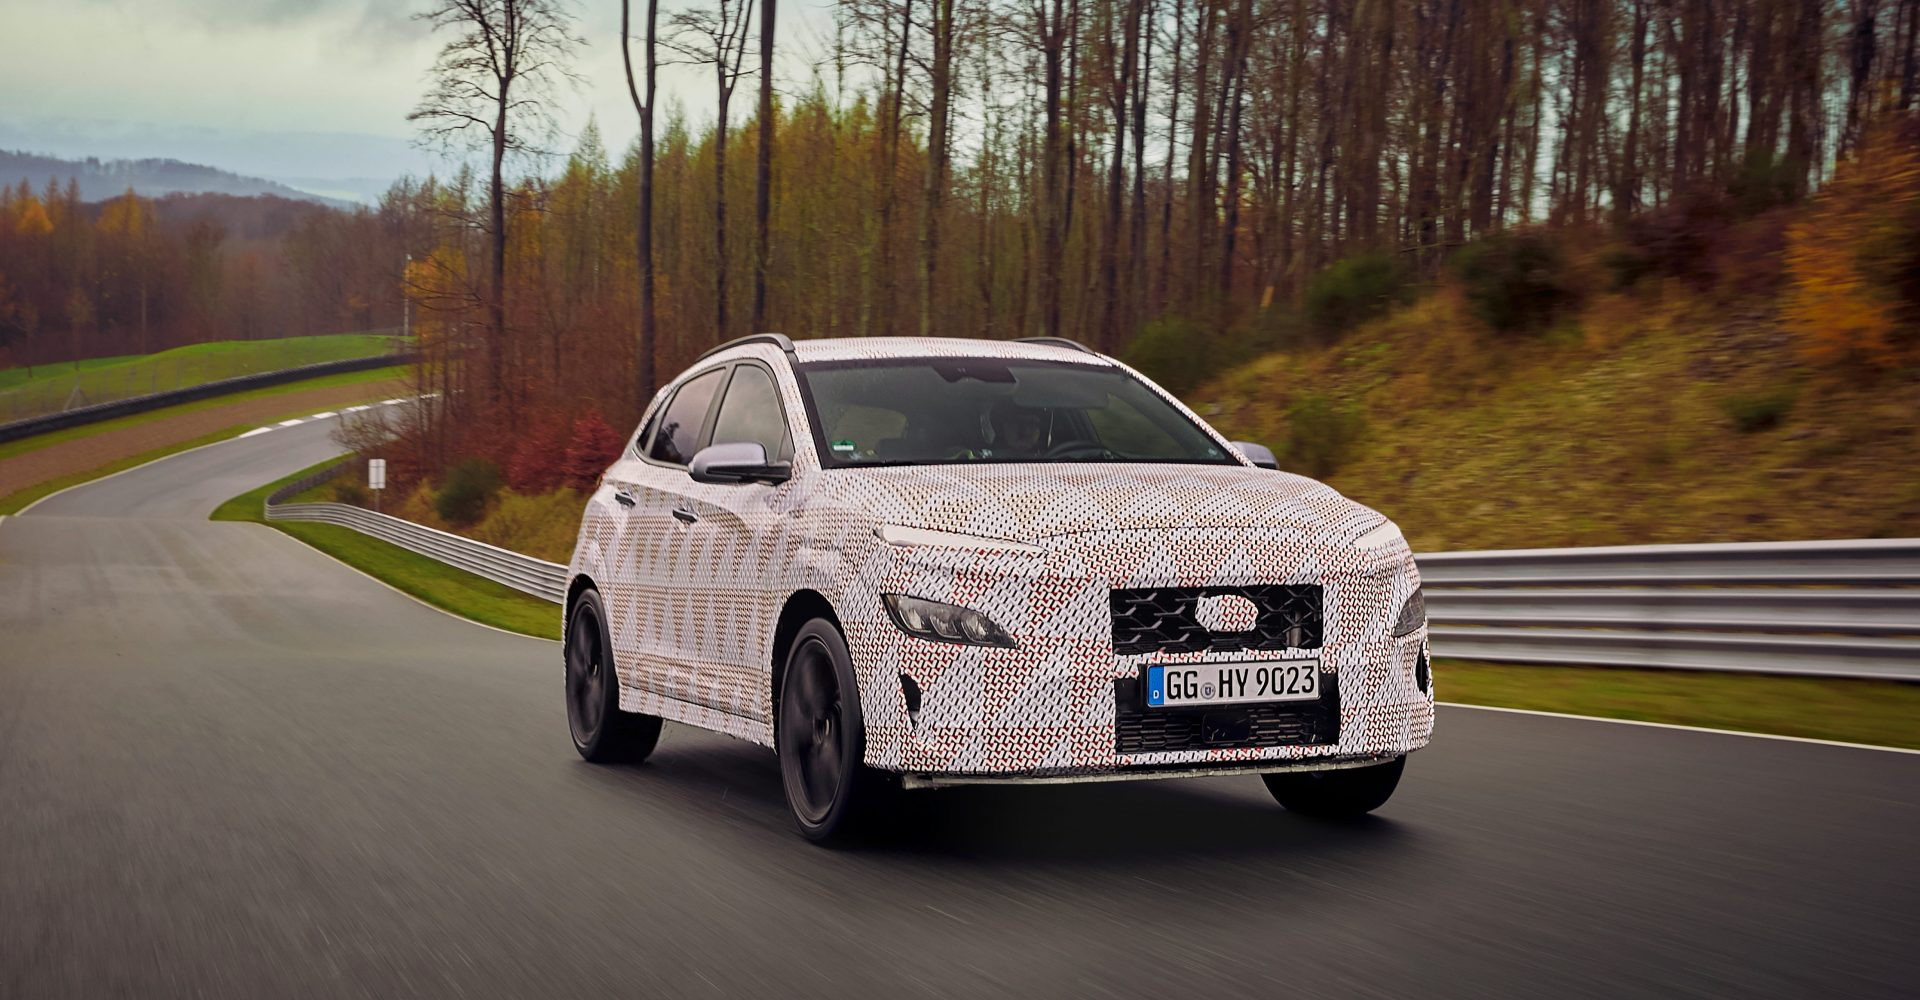 Hyundai teases Kona N performance SUV